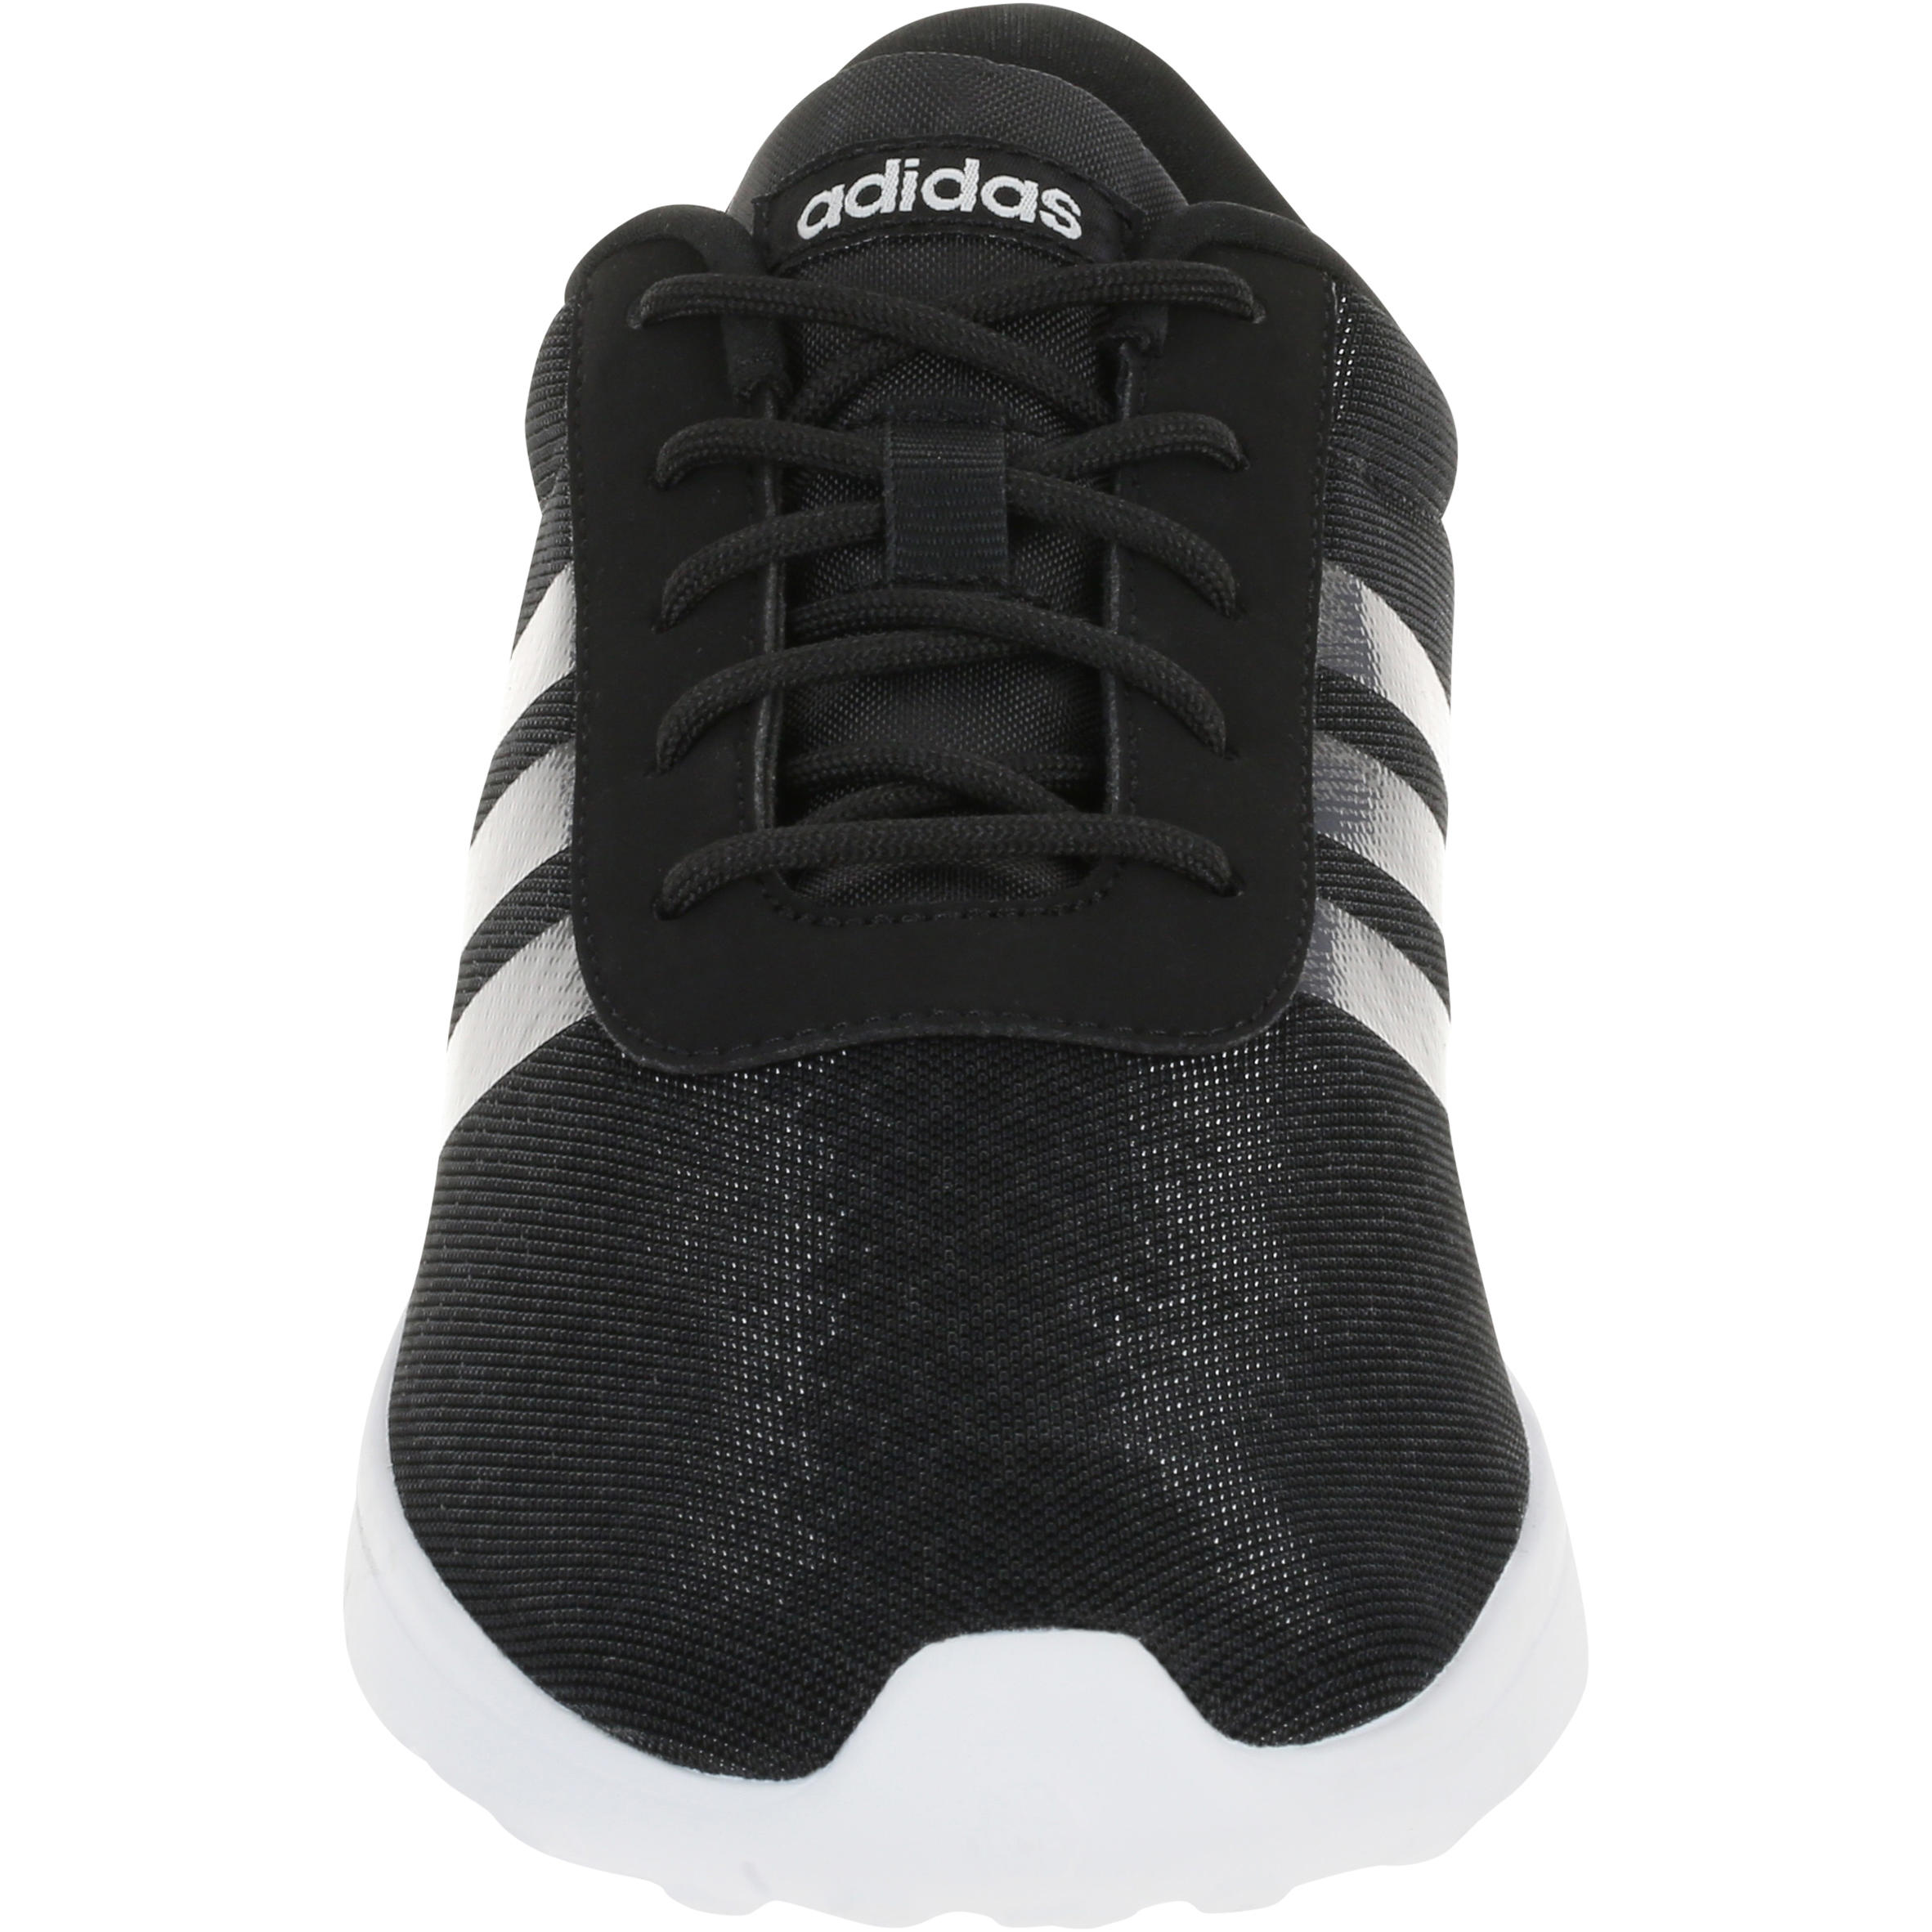 Lite Chaussures Noir Racer Femme Marche Sportive WoerxdCB